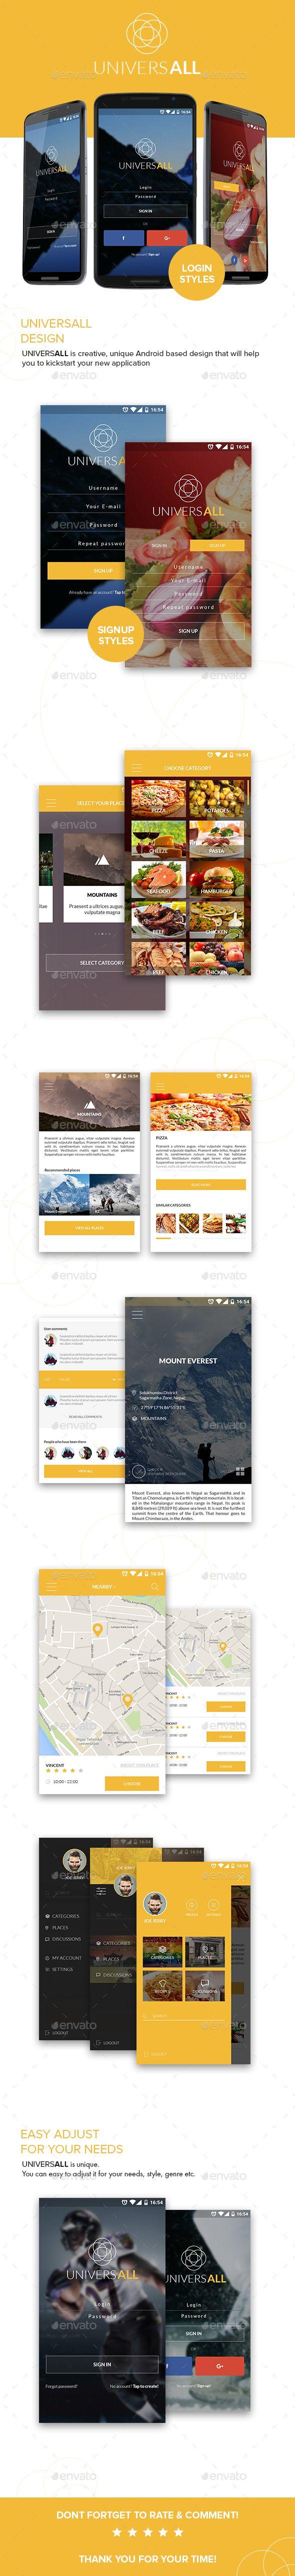 Universall   Mobile App Design